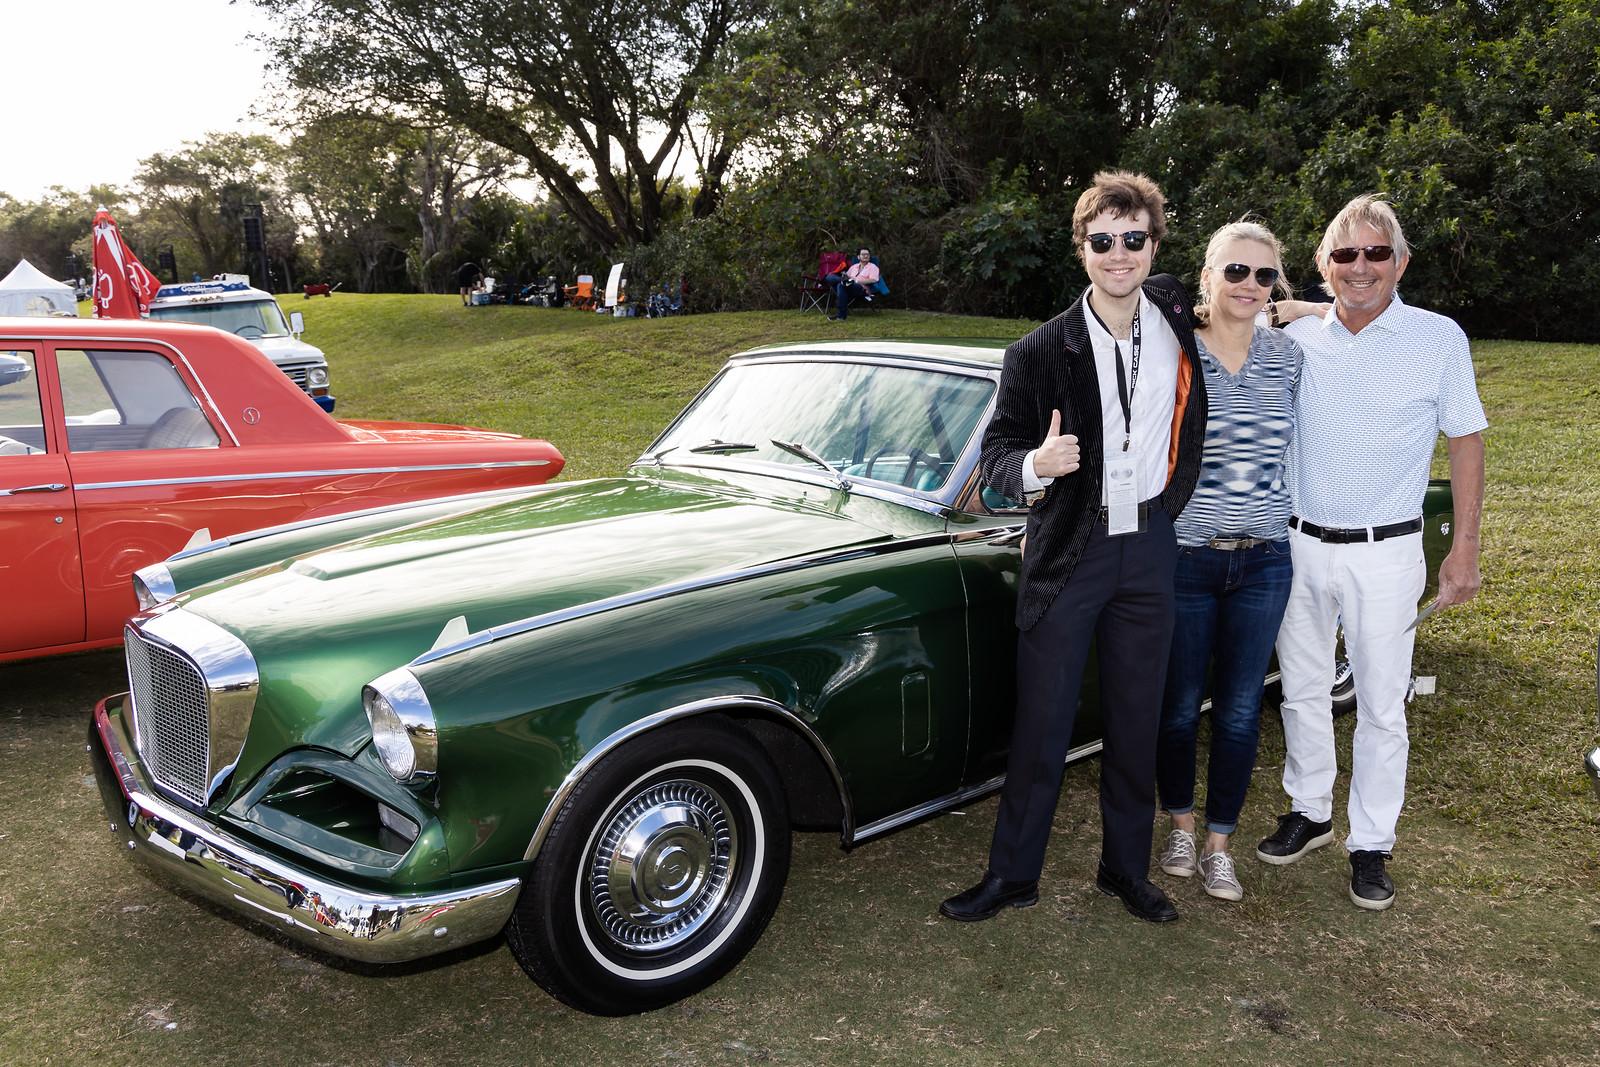 1962 Studebaker GT Hawk family